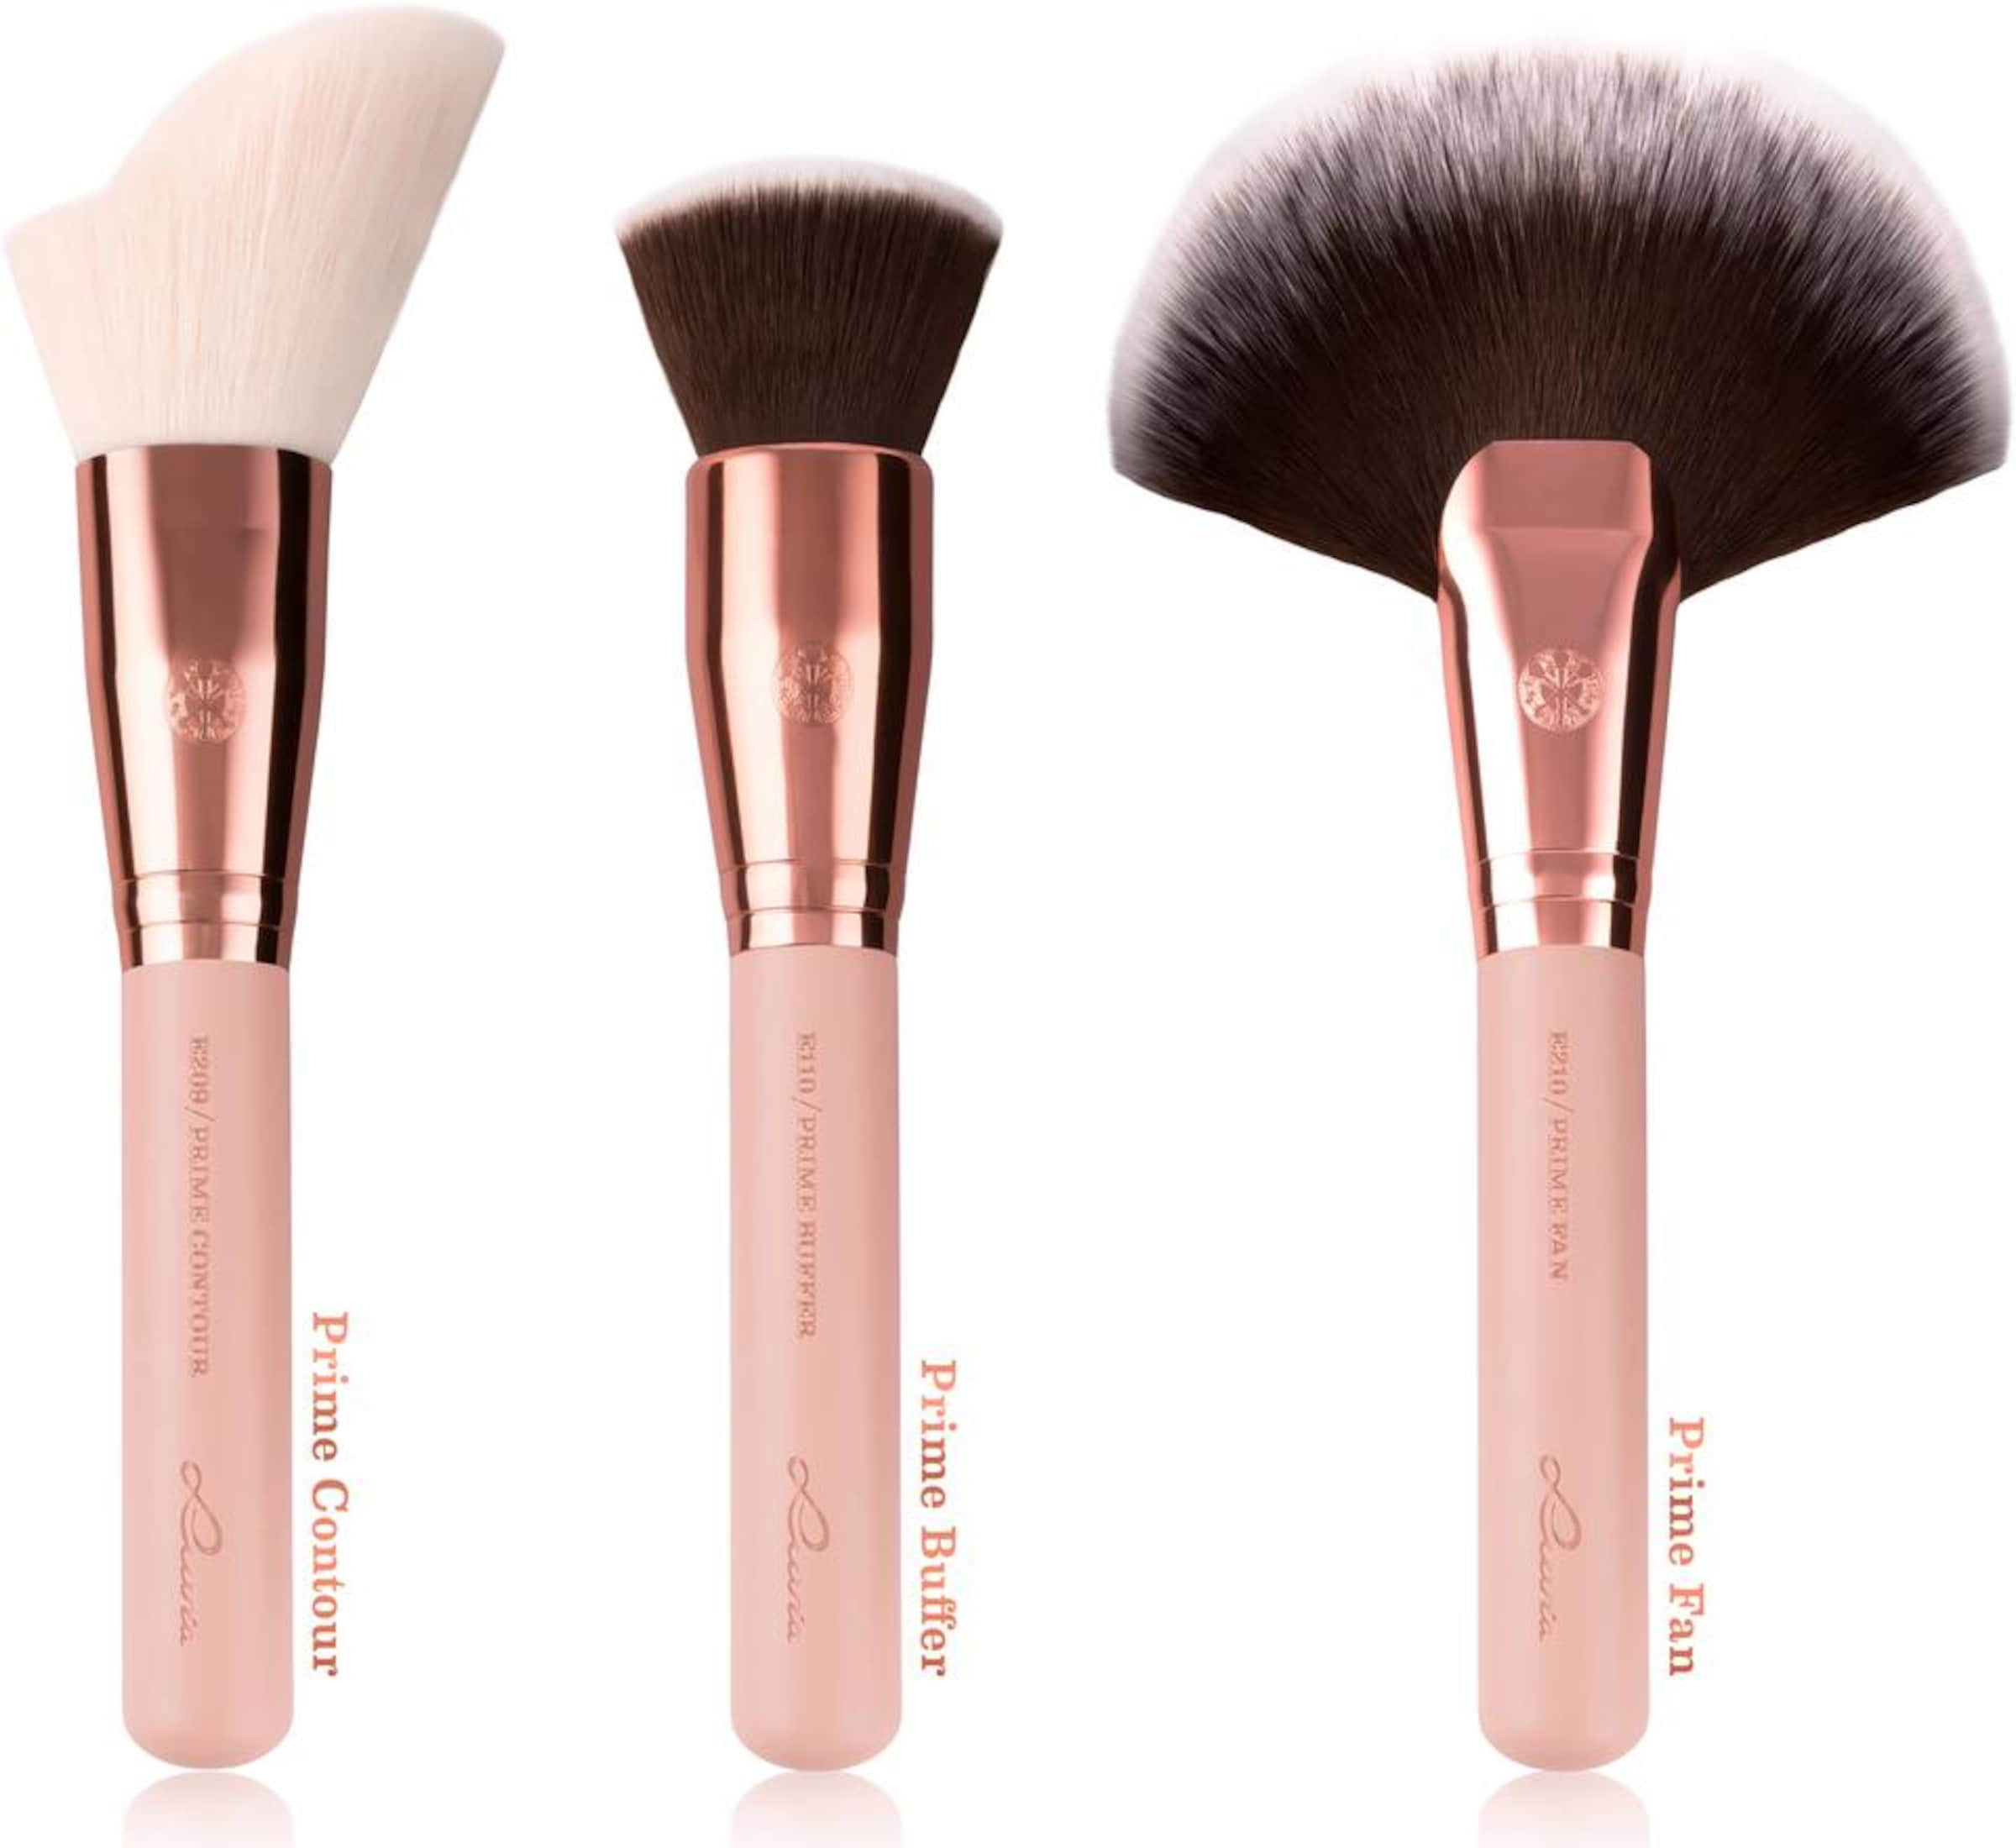 Make 'Essential Vintage' Golden Up mit Pinseltasche Brushes Rose Luvia Cosmetics Pinselset Veganes 5wxCqXX0R